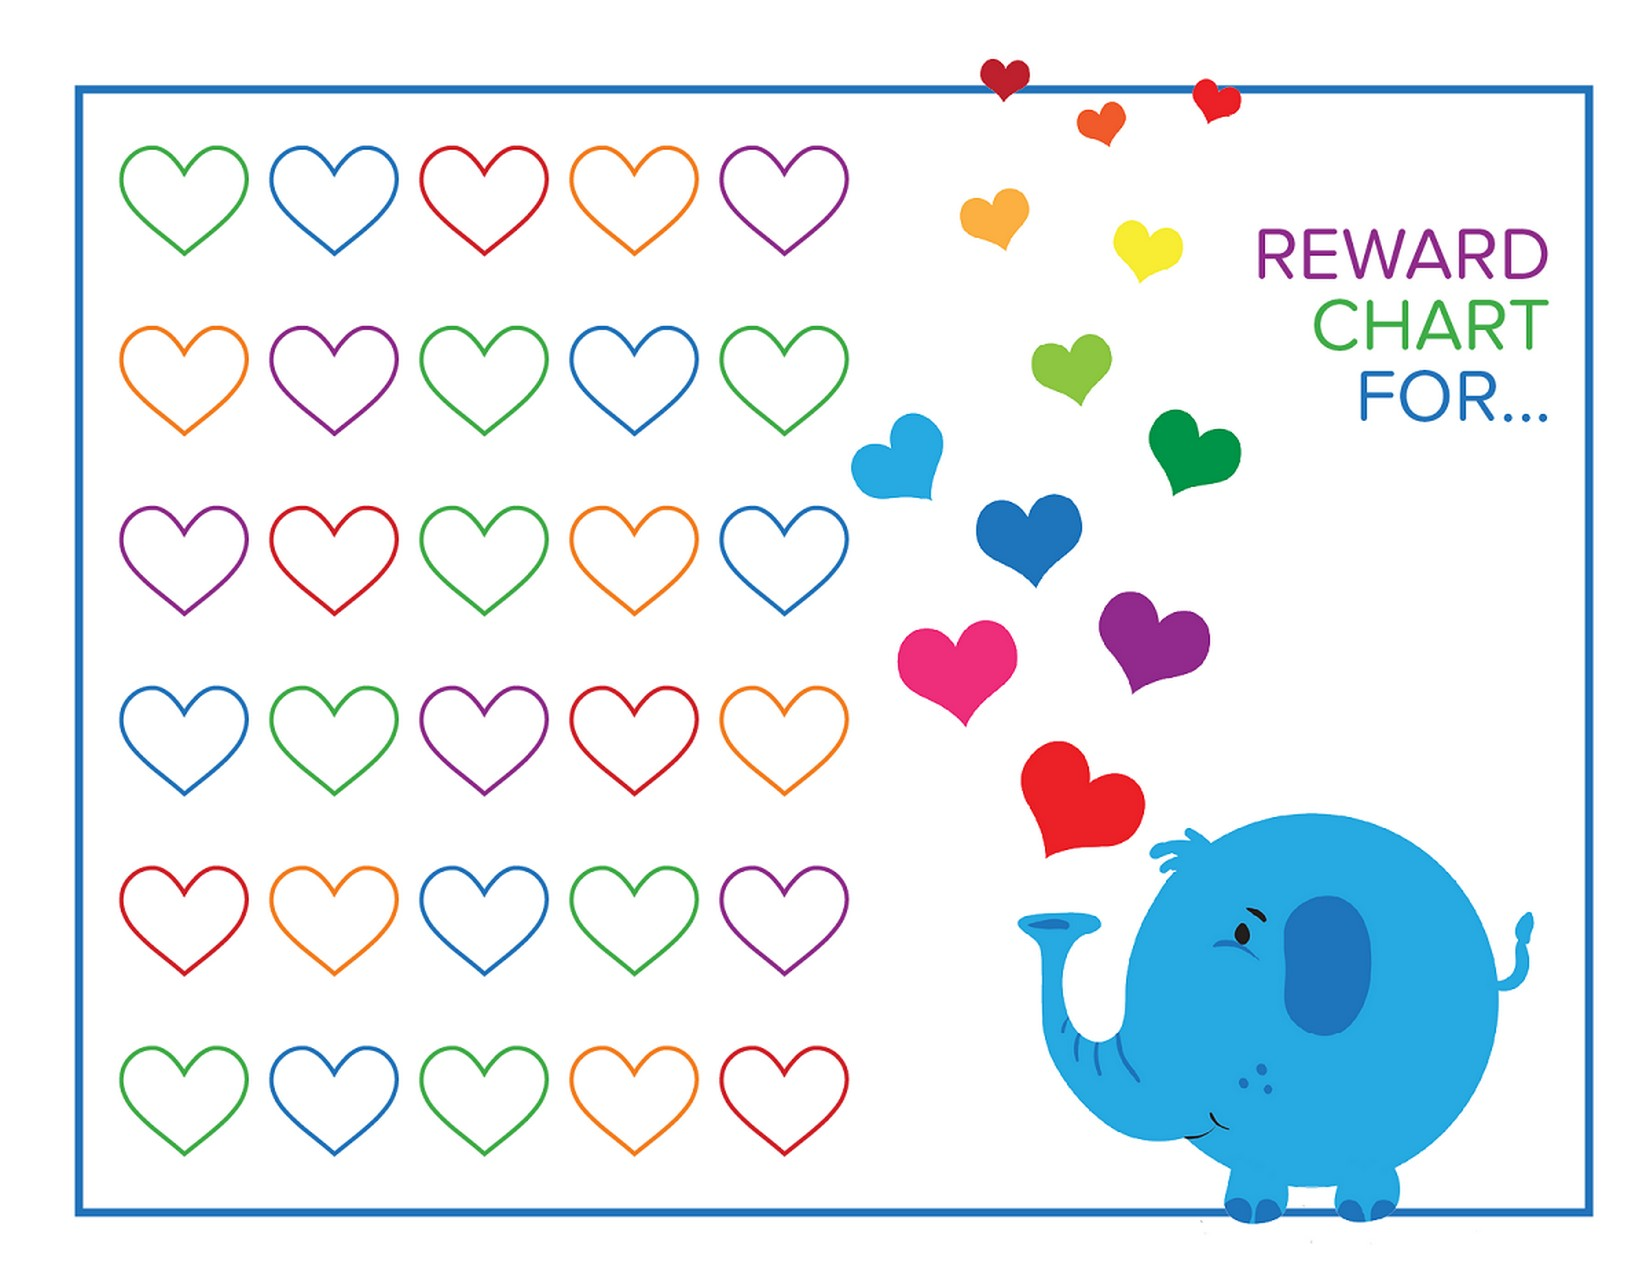 reward charts for kids rainbow